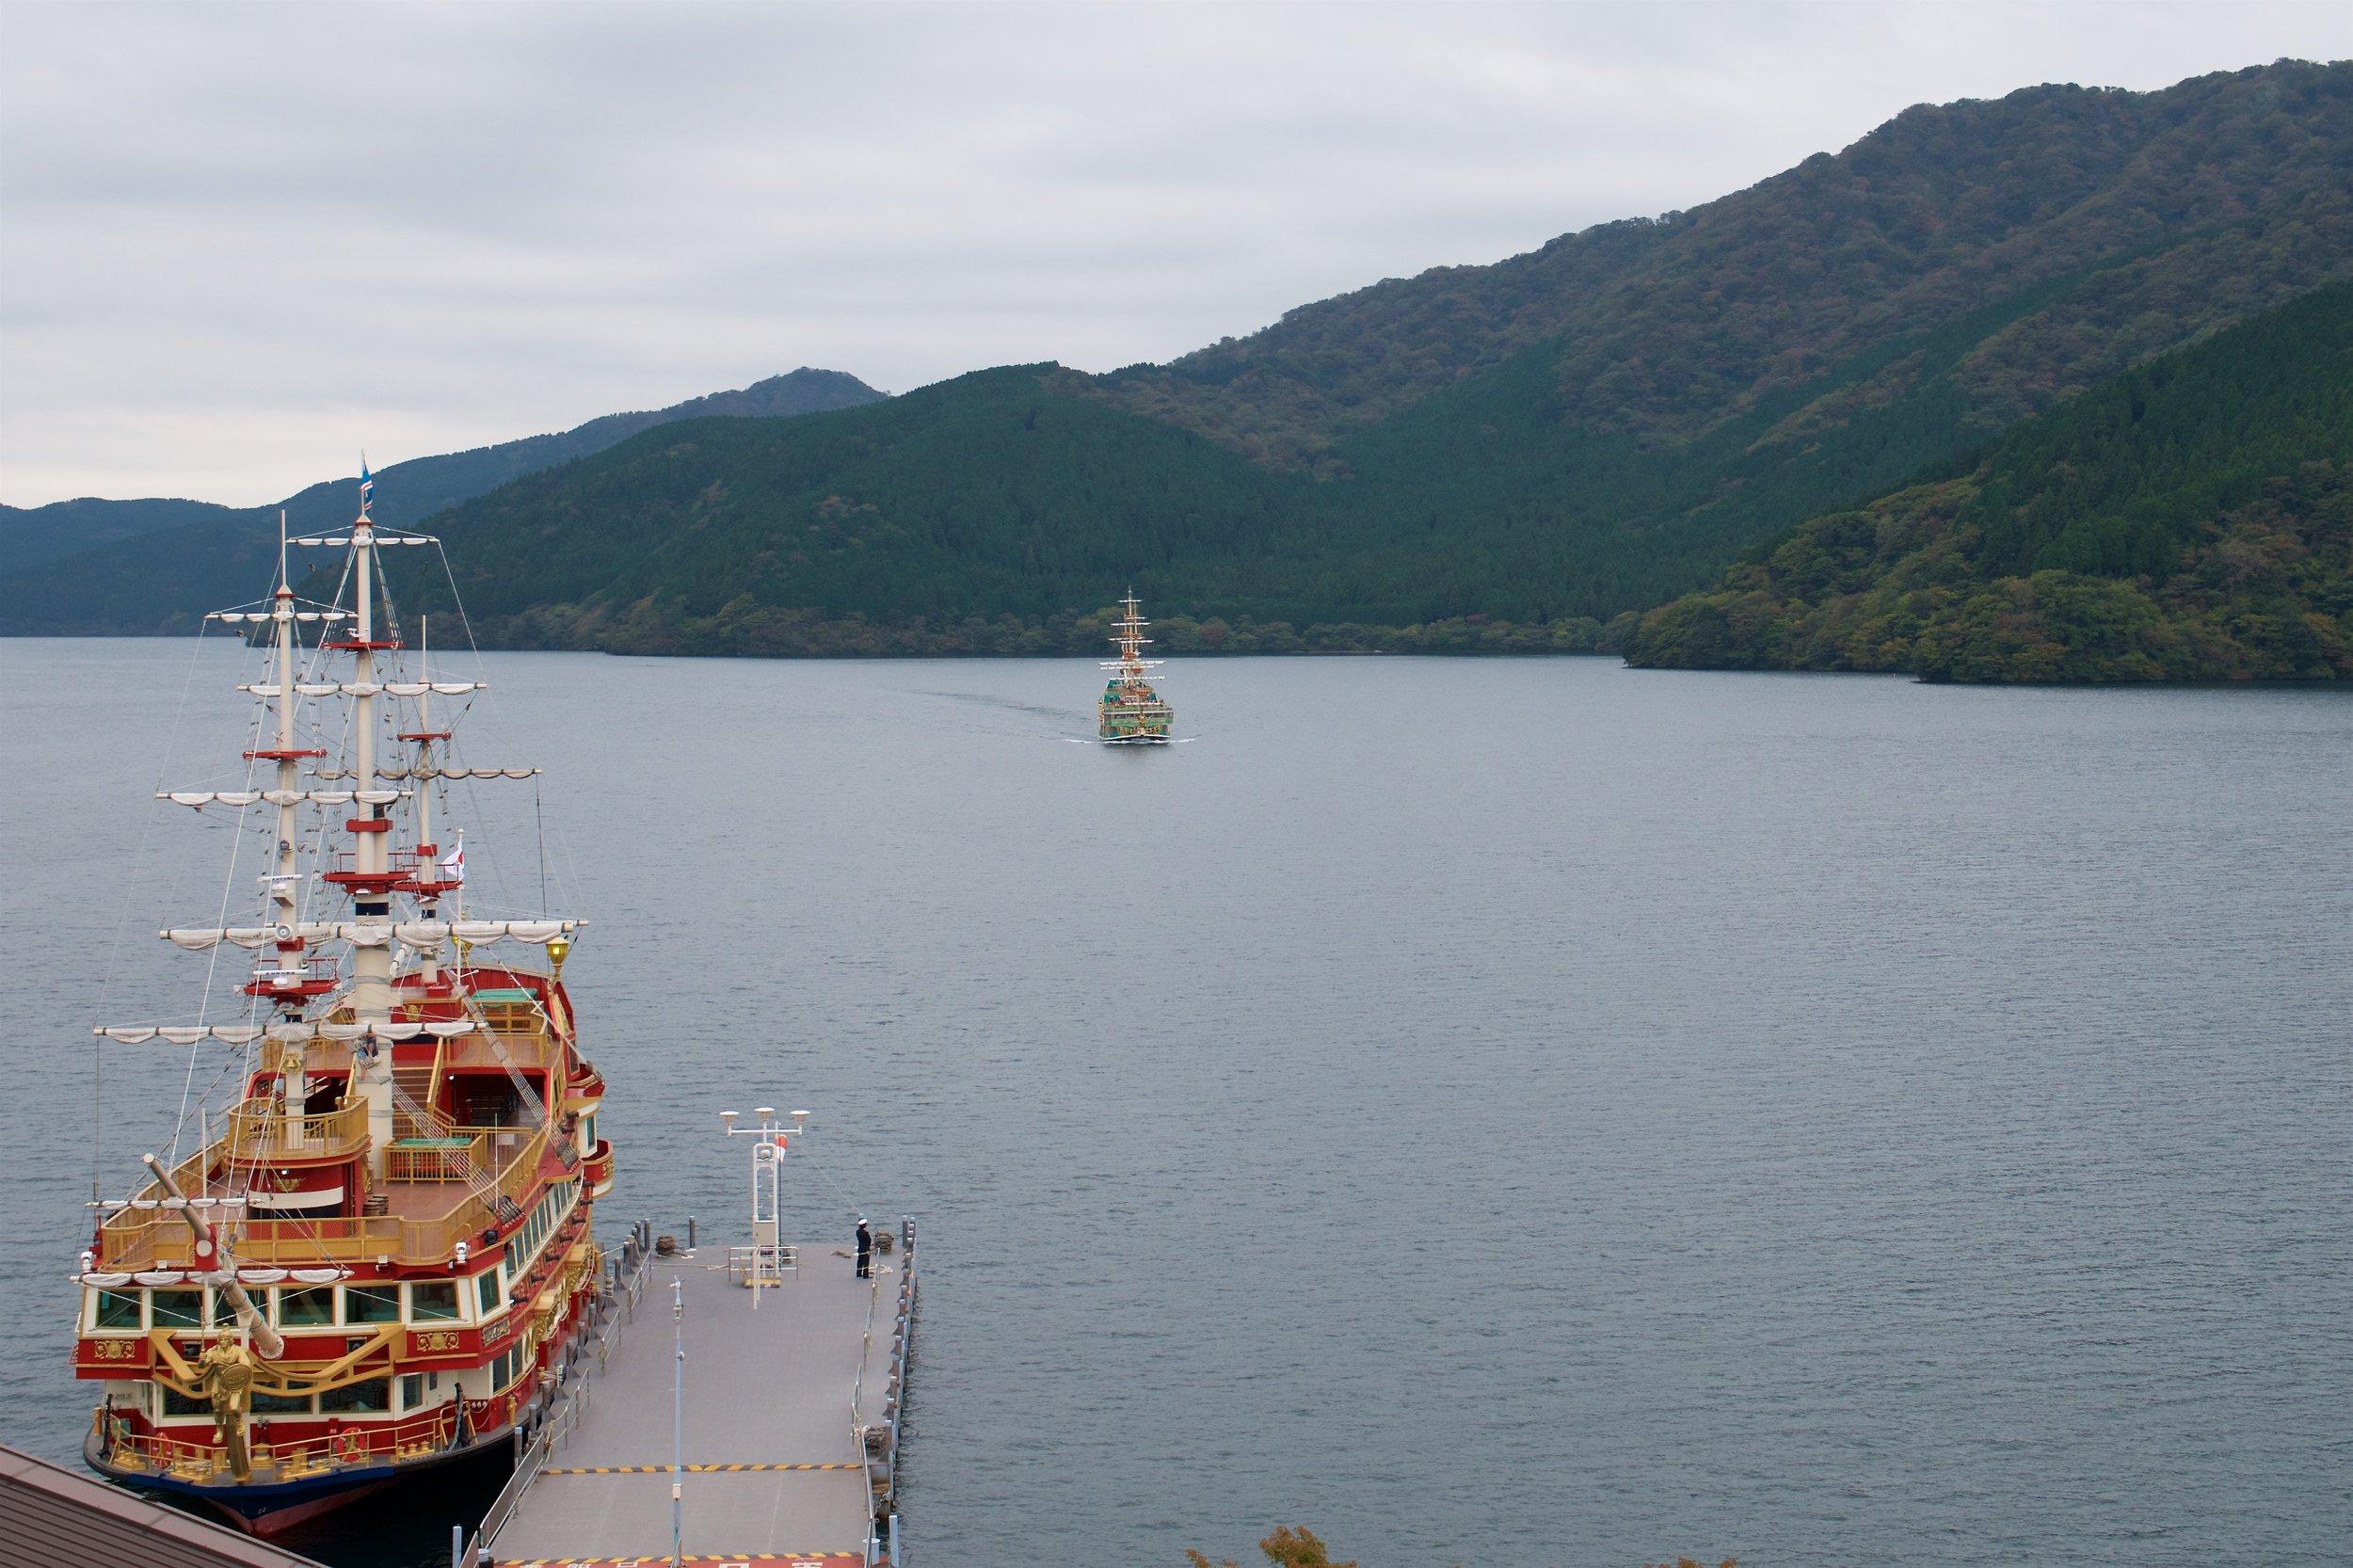 Our ship for the trip across Lake Ashi